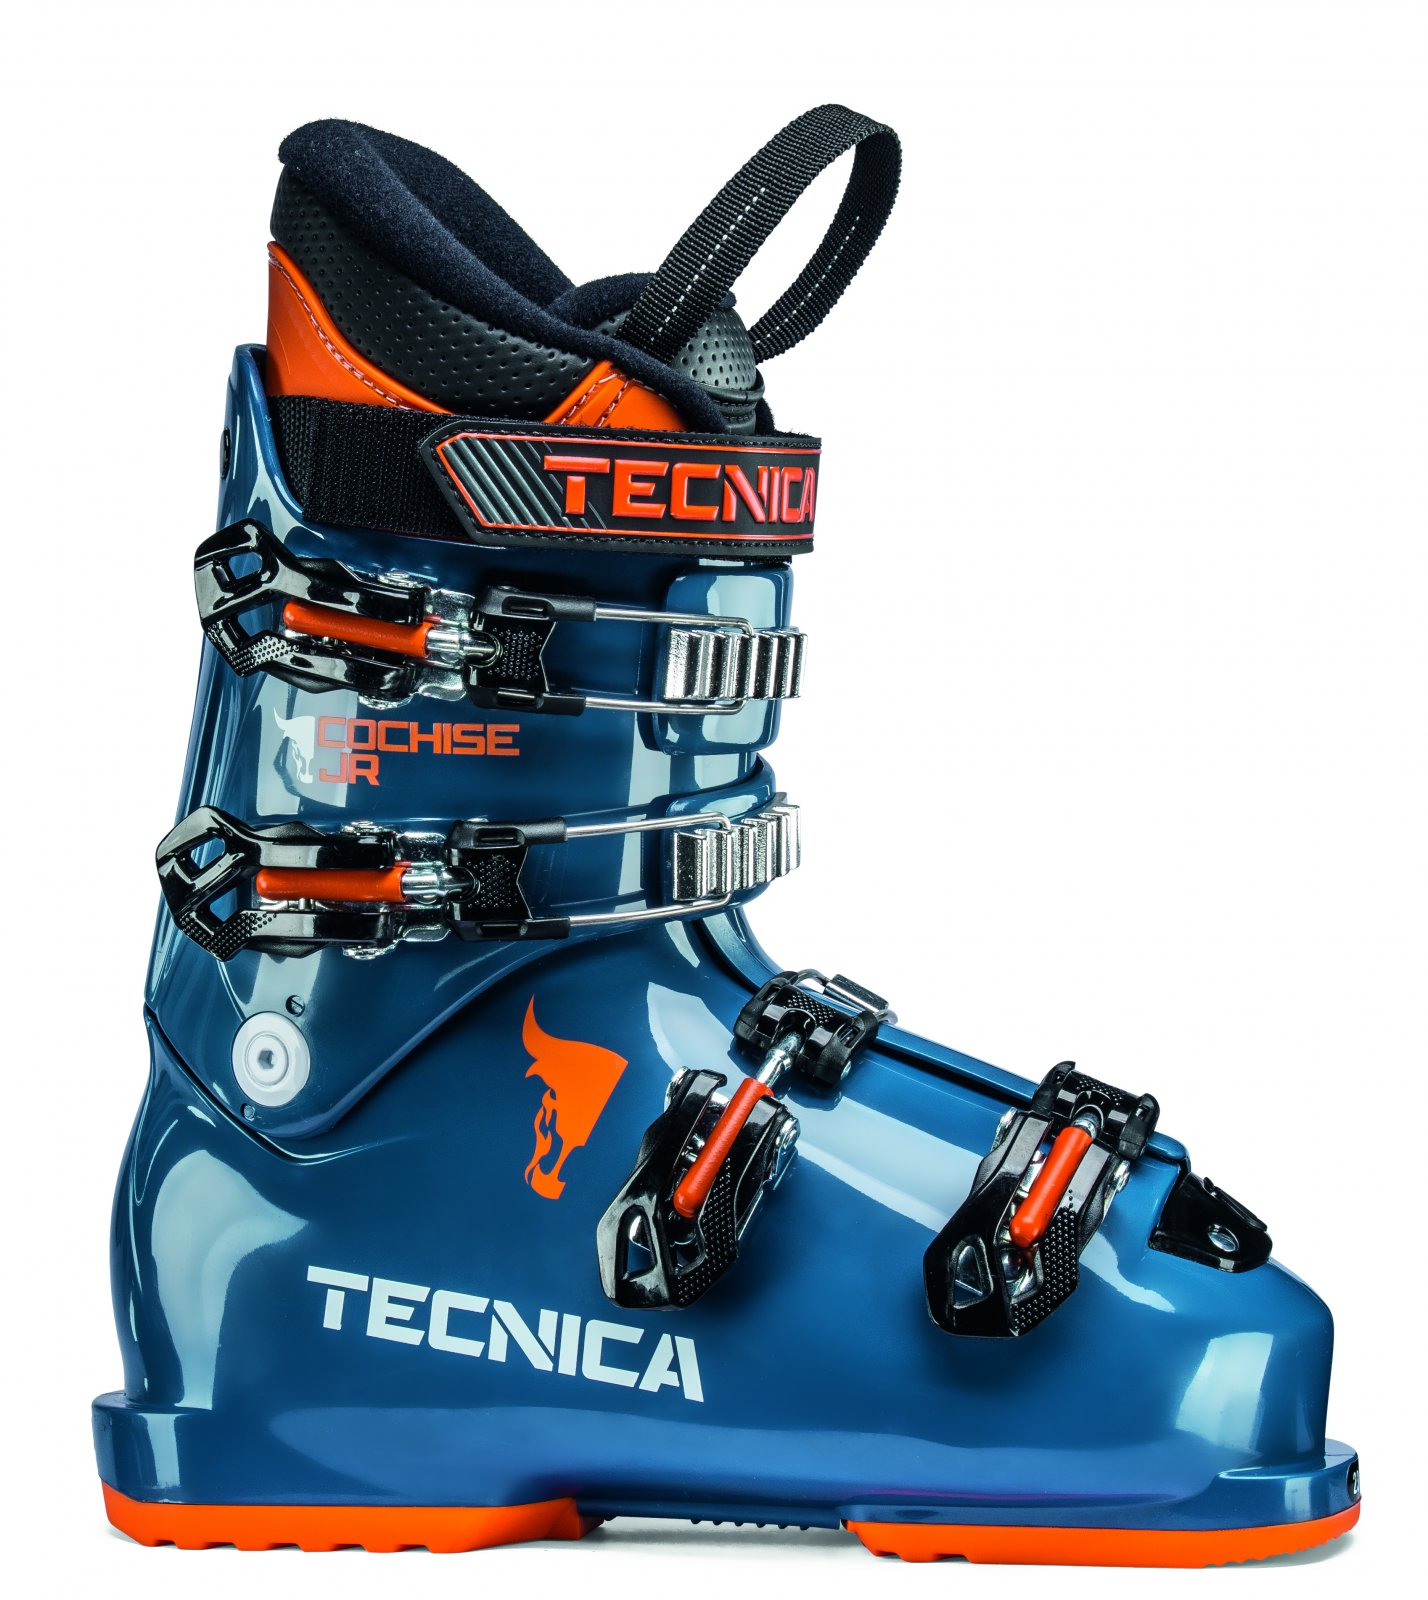 2020 Tecnica Cochise Jr Ski Boots